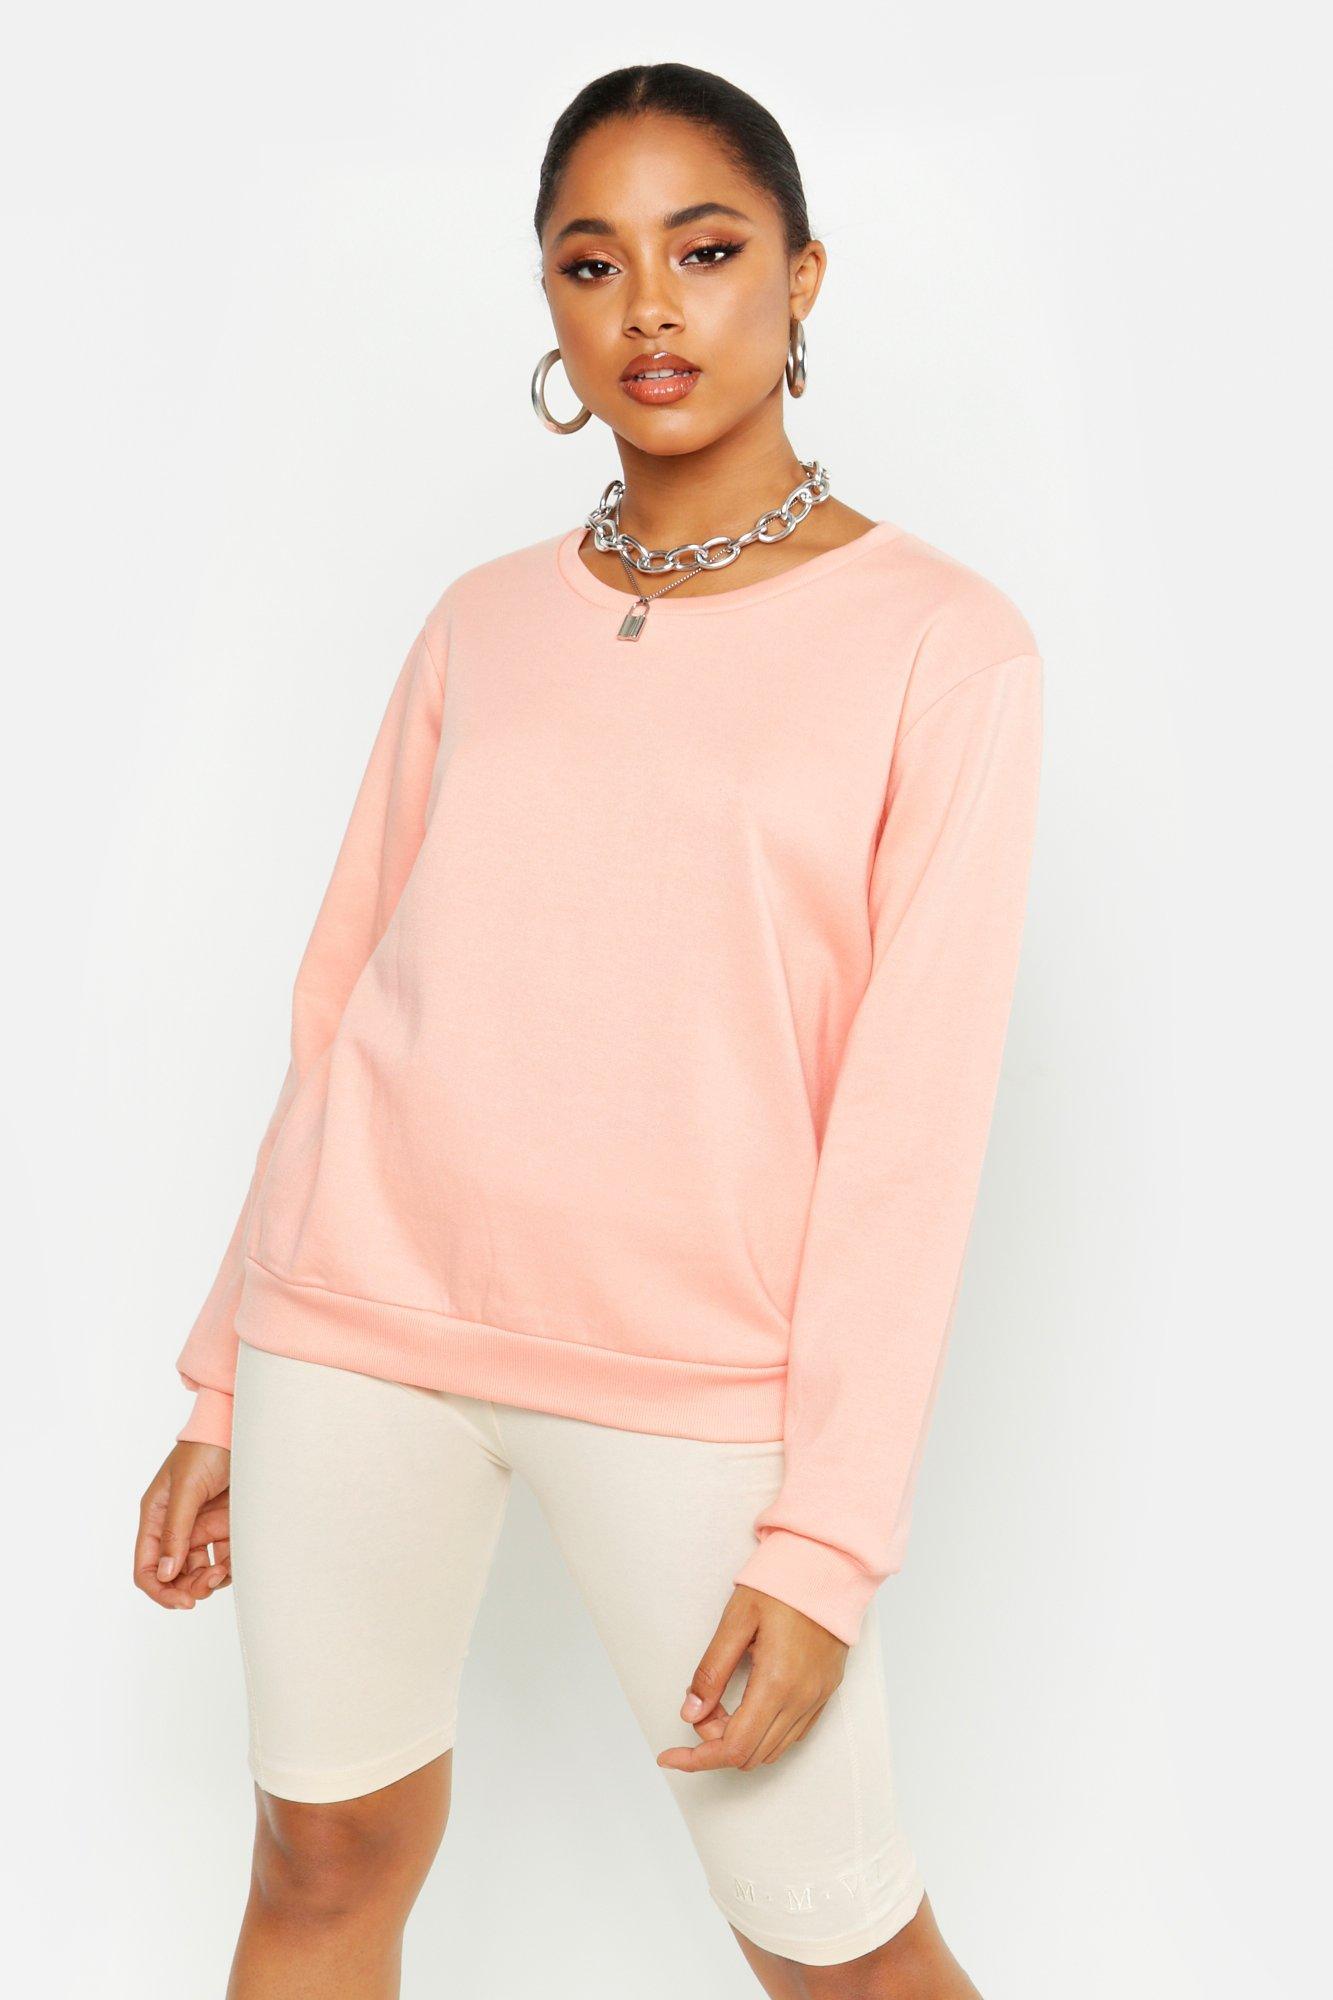 Womens Crew Neck Sweatshirt - peach - XS, Peach - Boohoo.com